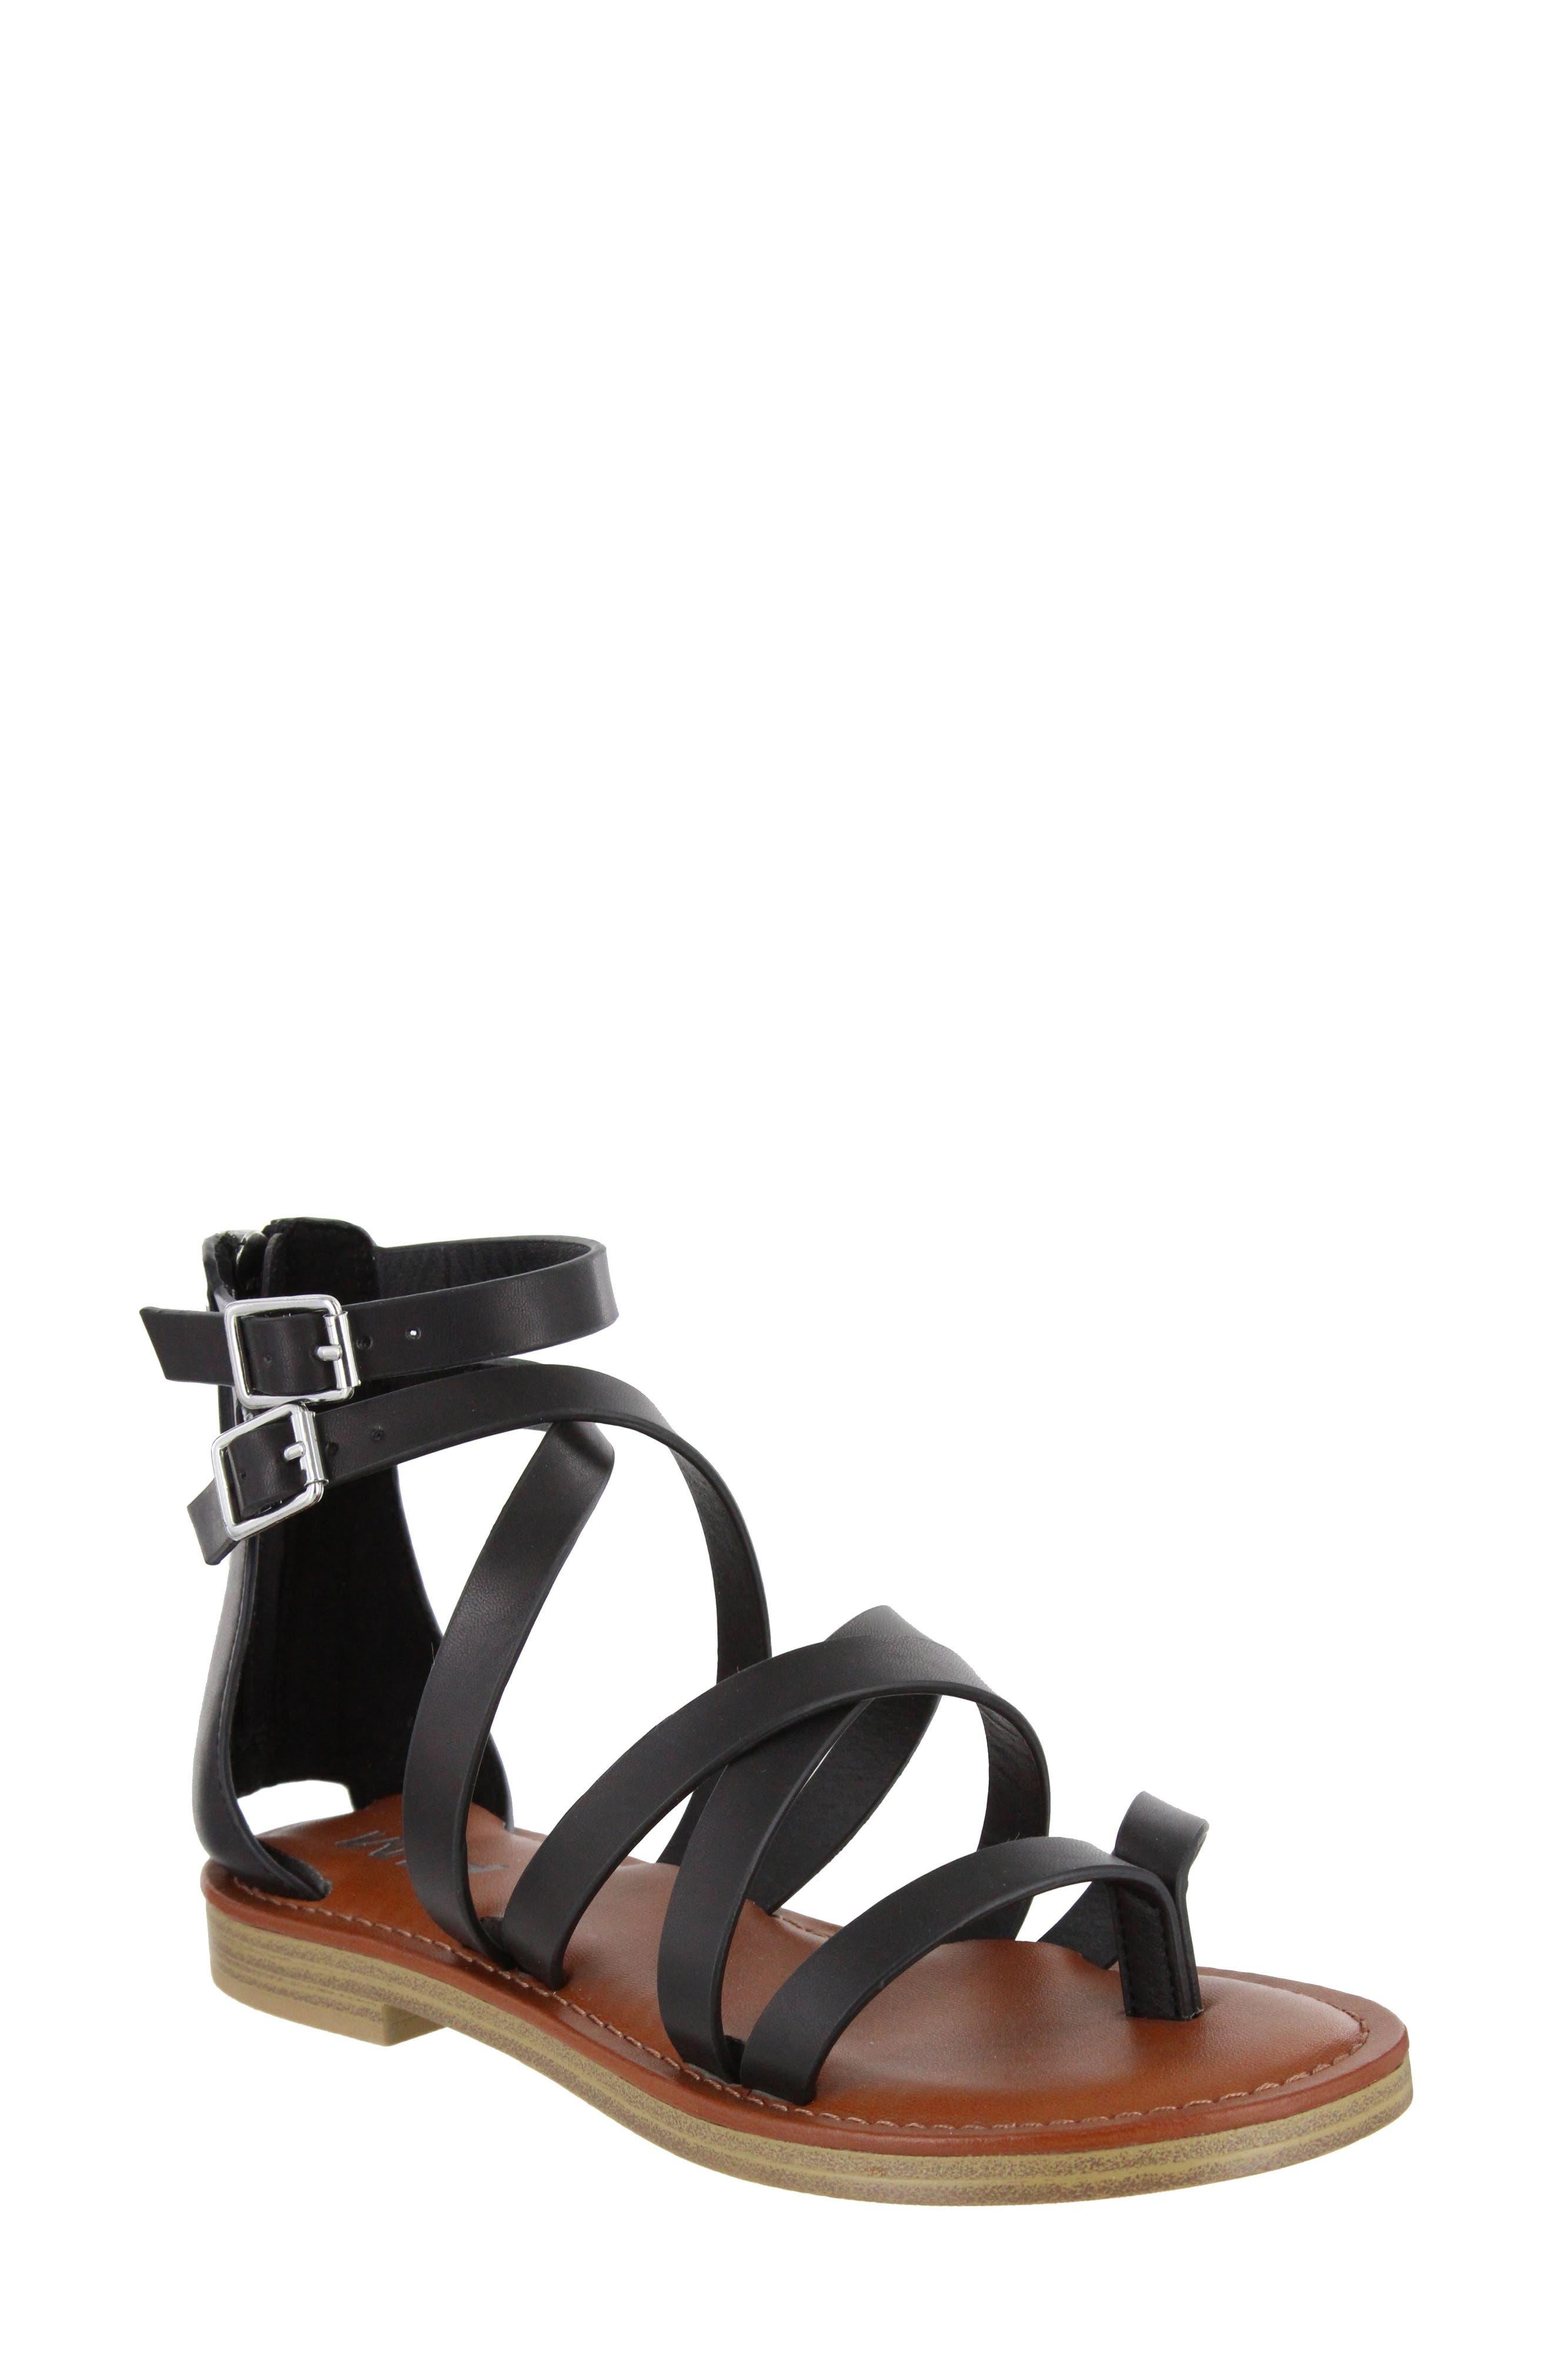 Alternate Image 1 Selected - MIA Agitha Gladiator Sandal (Women)